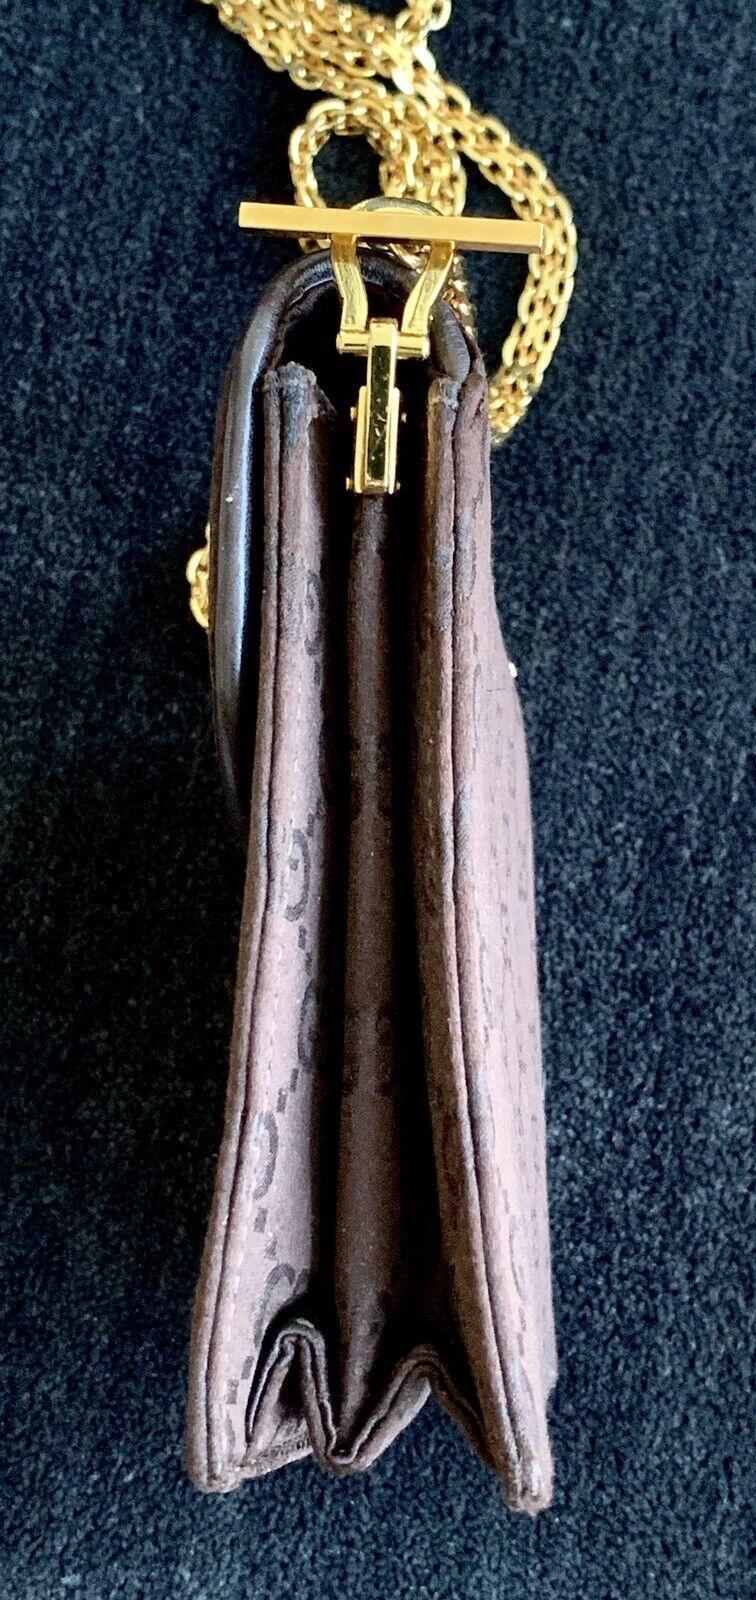 Gucci Vintage Classic Handbag with original box  - image 12